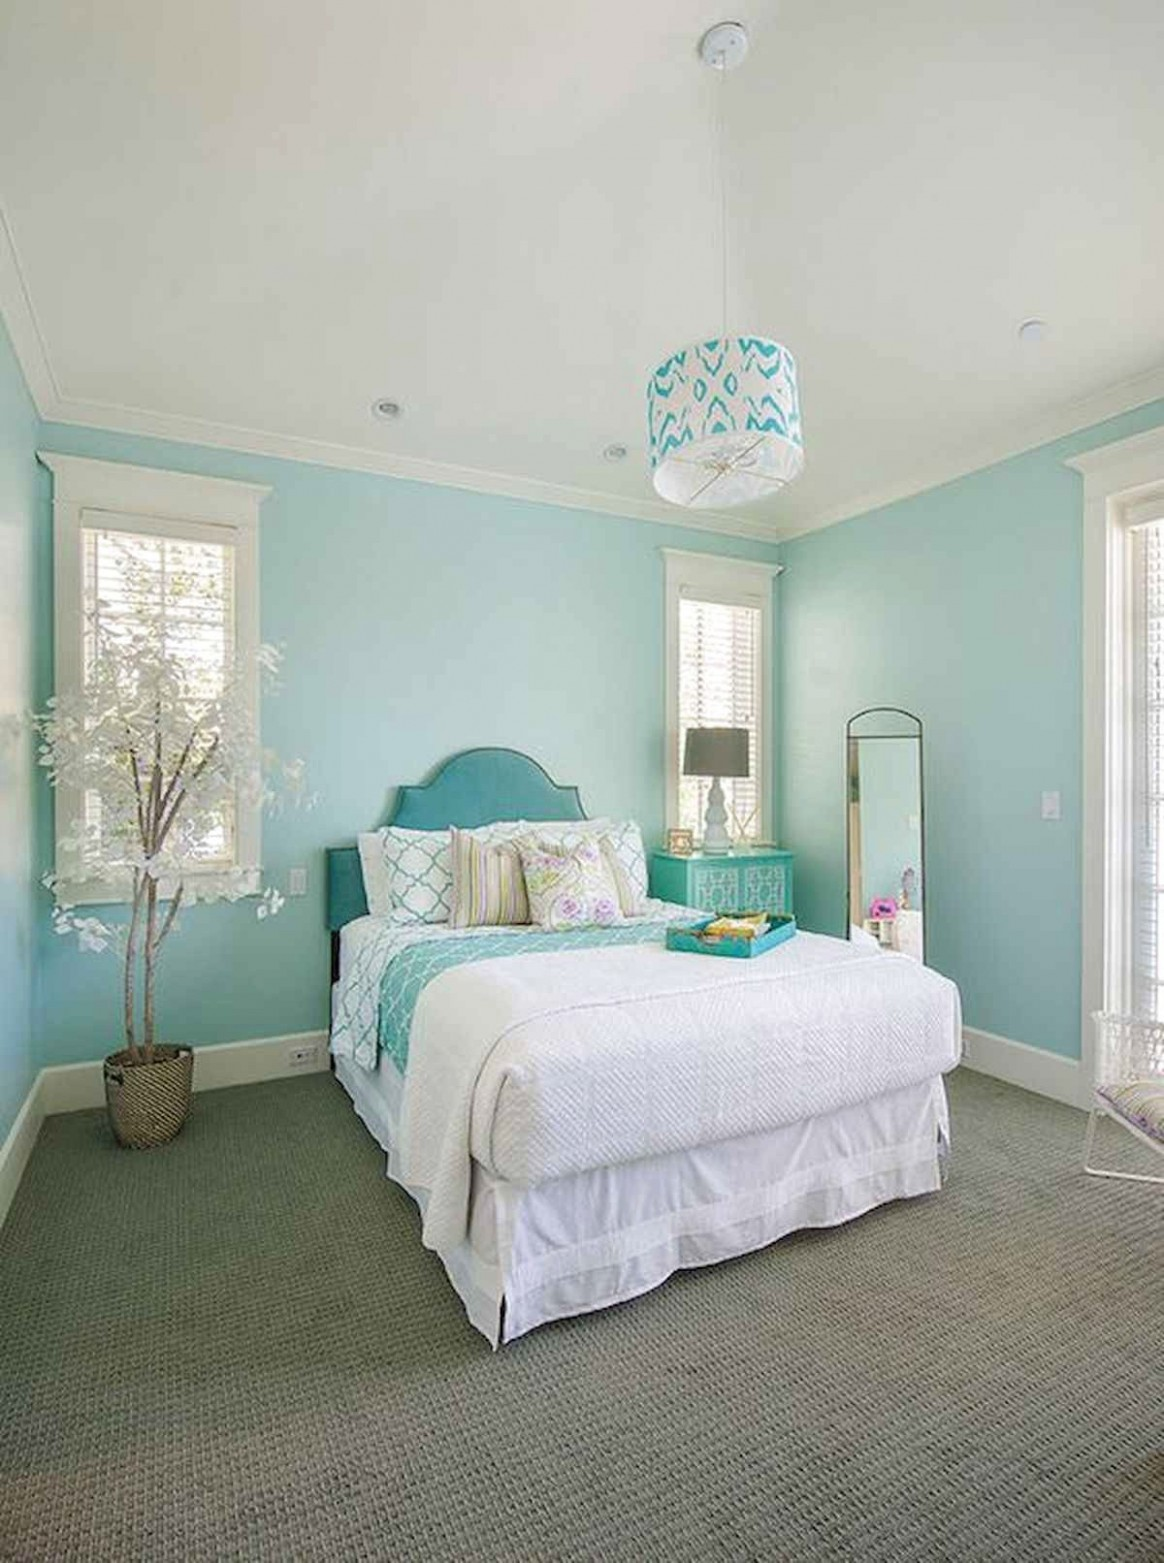 Favorite Farmhouse Master Bedroom Decor Ideas  Turquoise room  - Bedroom Ideas Turquoise